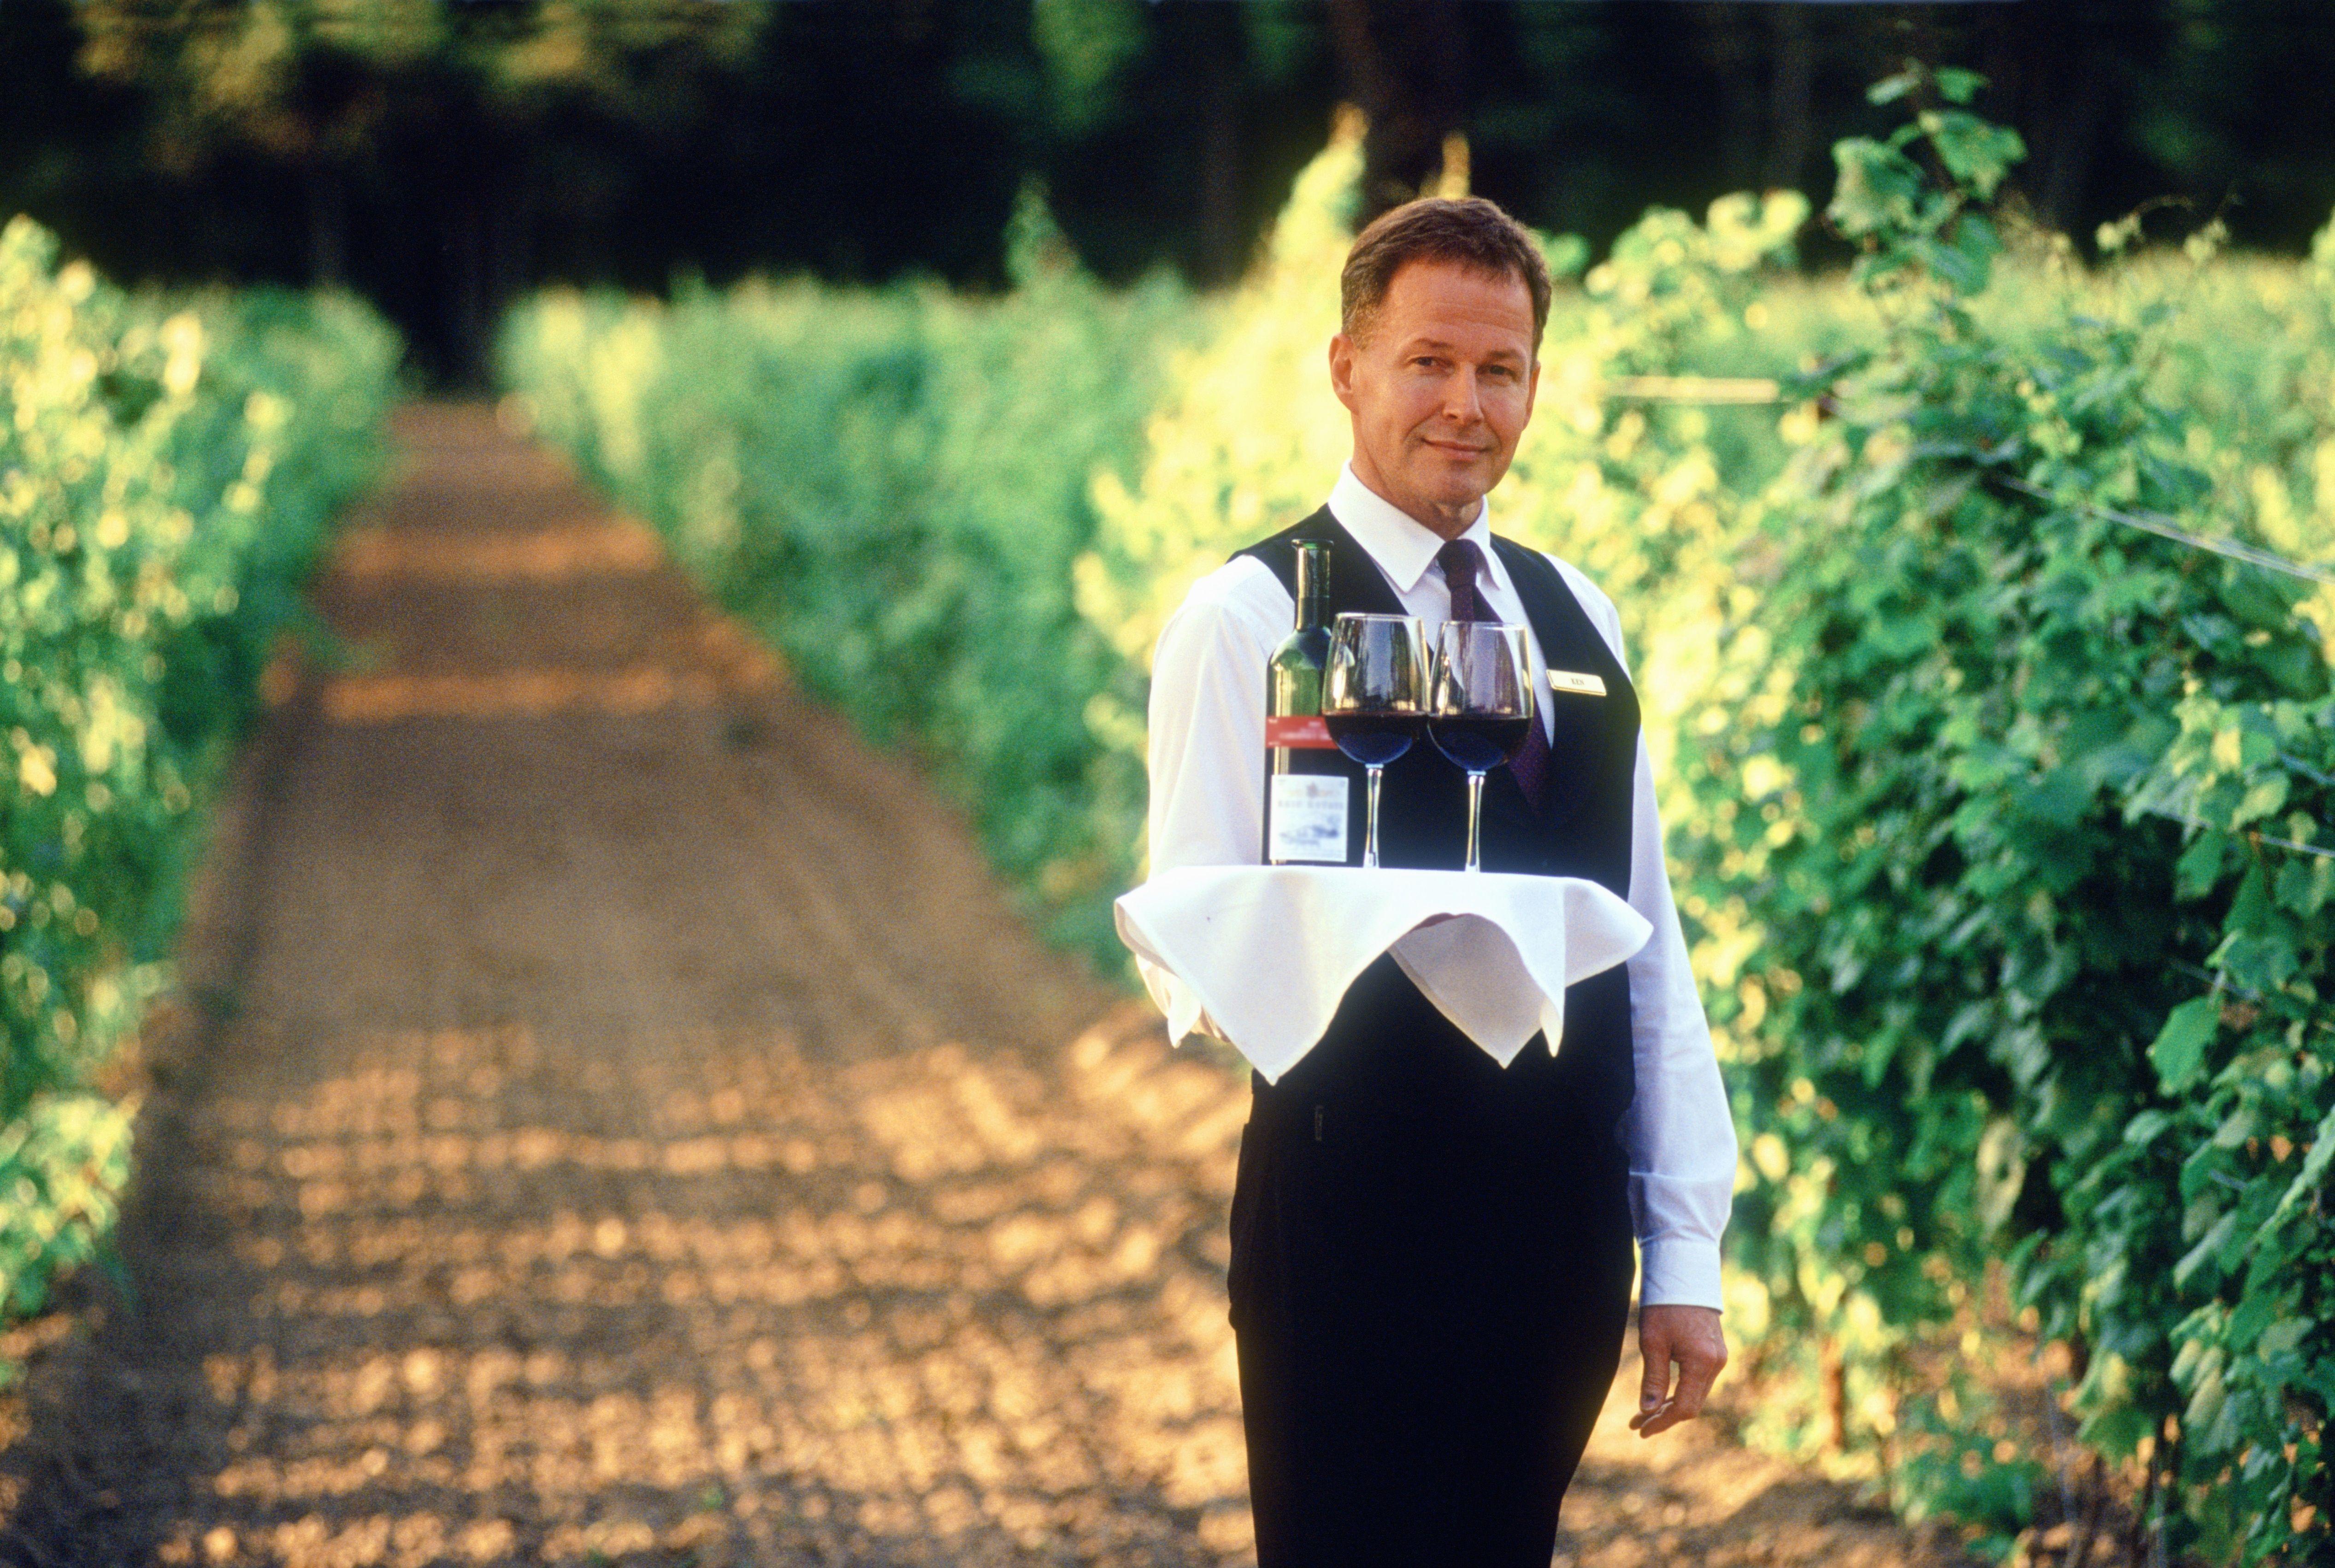 Waiter in Vineyard at Niagara-on-the-Lake, Ontario, Canada